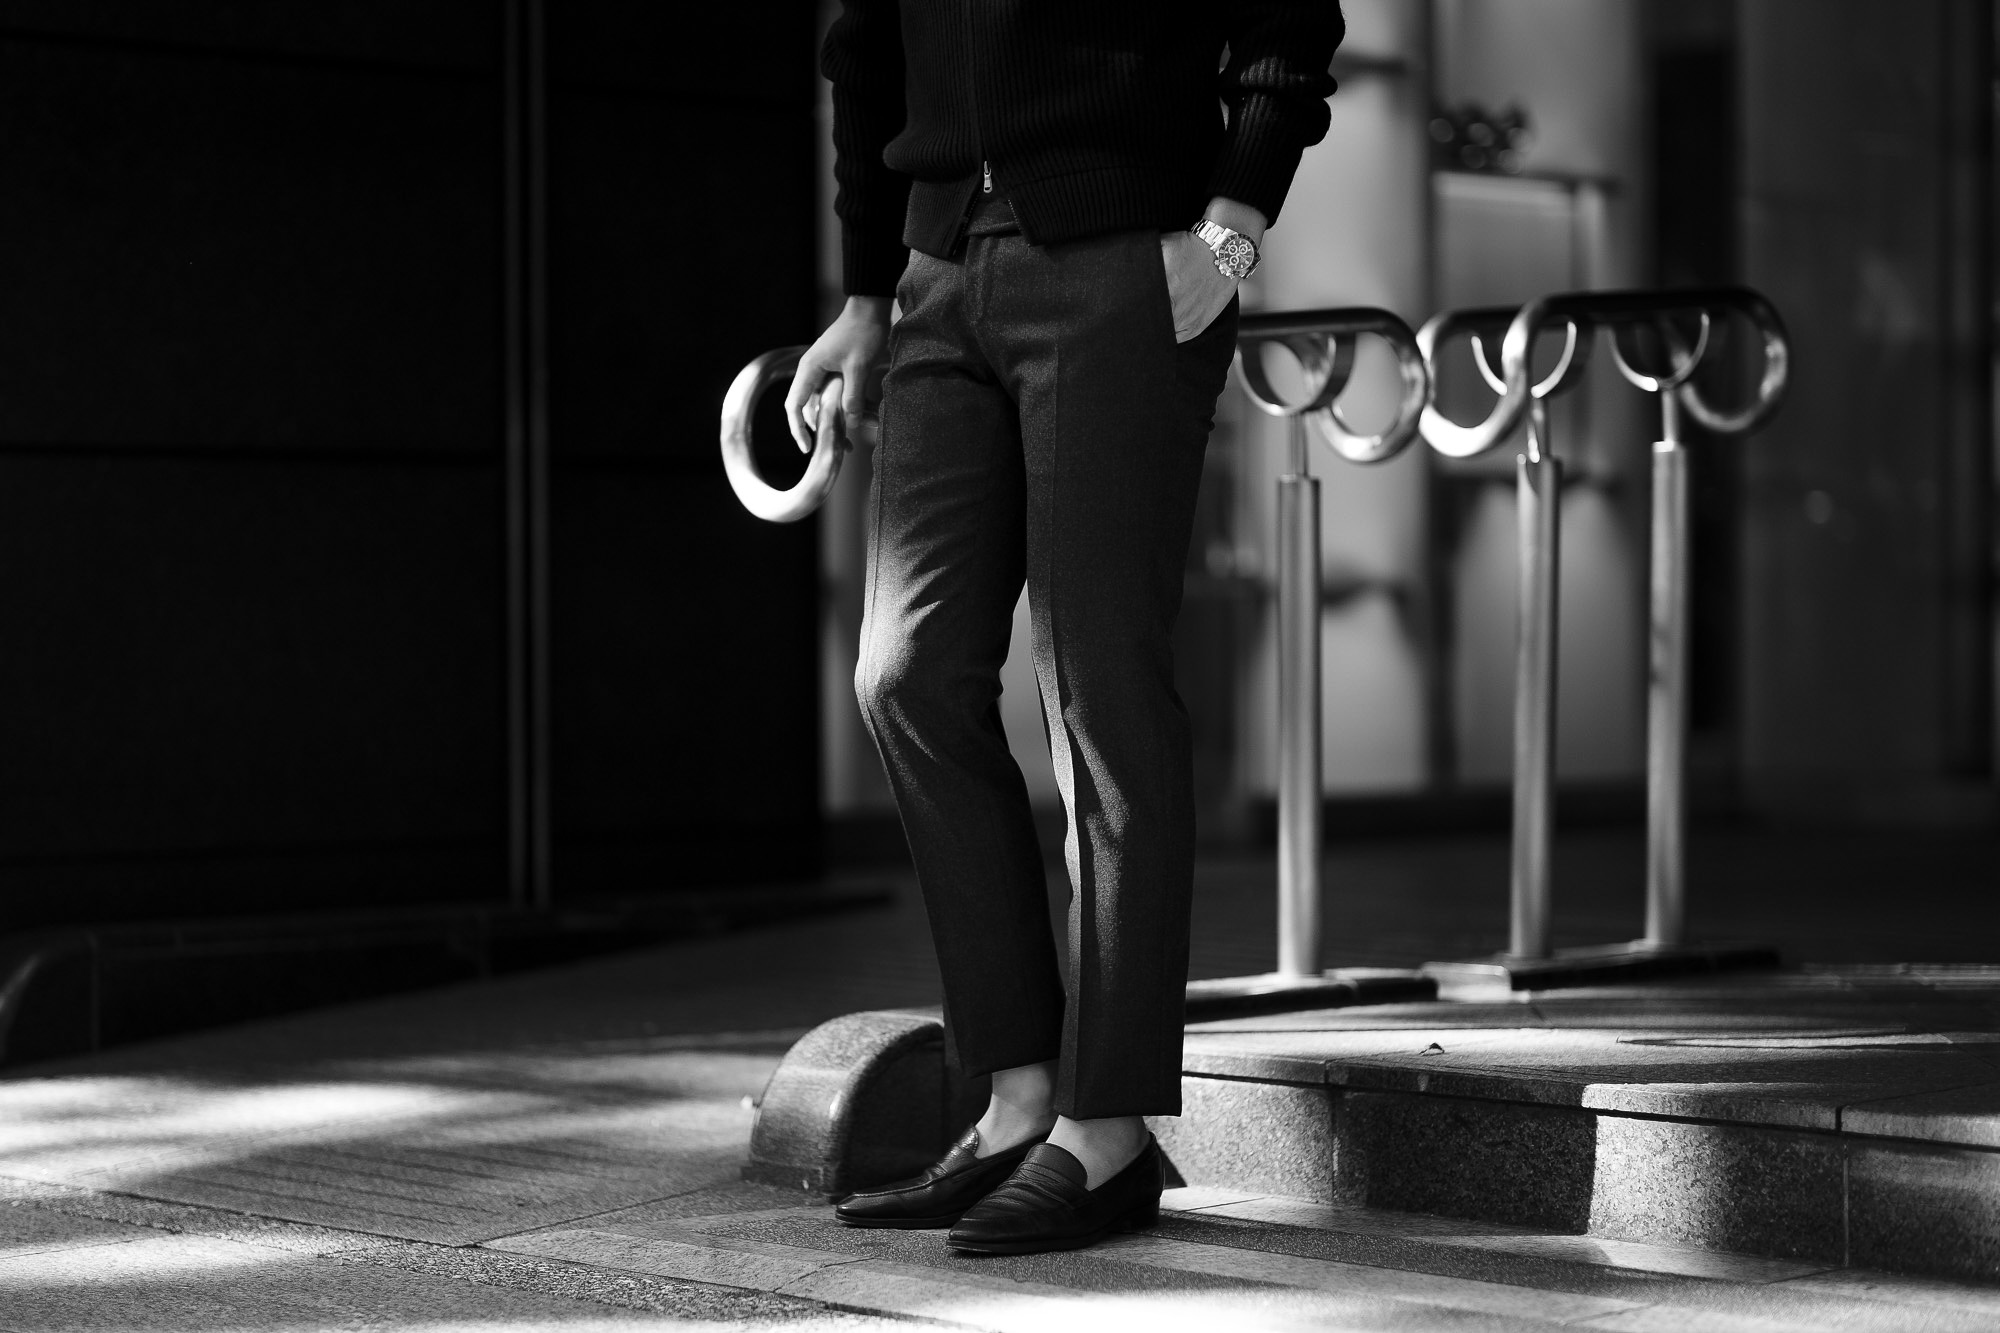 INCOTEX (インコテックス) N35 SLIM FIT (1T035R) URBAN TRAVELER (アーバントラベラー) TECHNO TWILL 撥水 ウォッシャブル ナチュラルストレッチ サージウール スラックス BLACK (ブラック・990) 2020 秋冬 【ご予約受付中】愛知 名古屋 altoediritto アルトエデリット